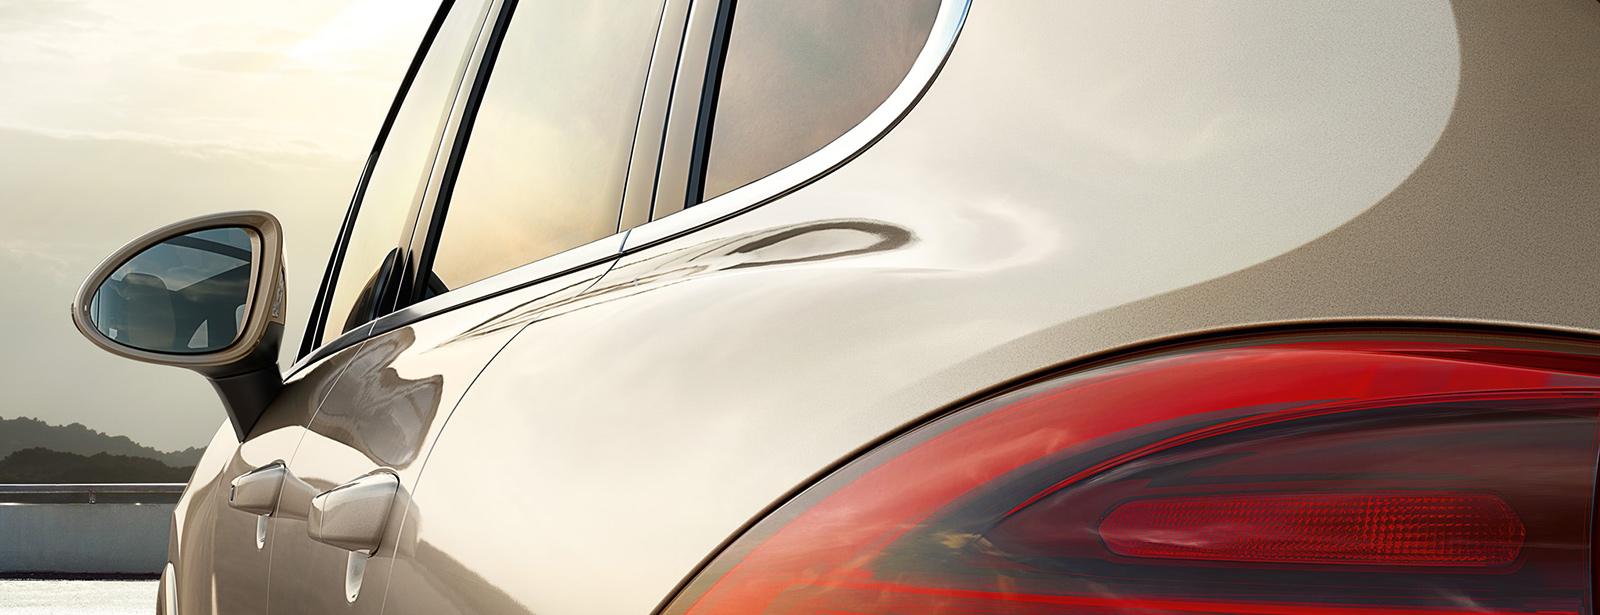 Fahrzeugaufbereitung Porsche Cayenne